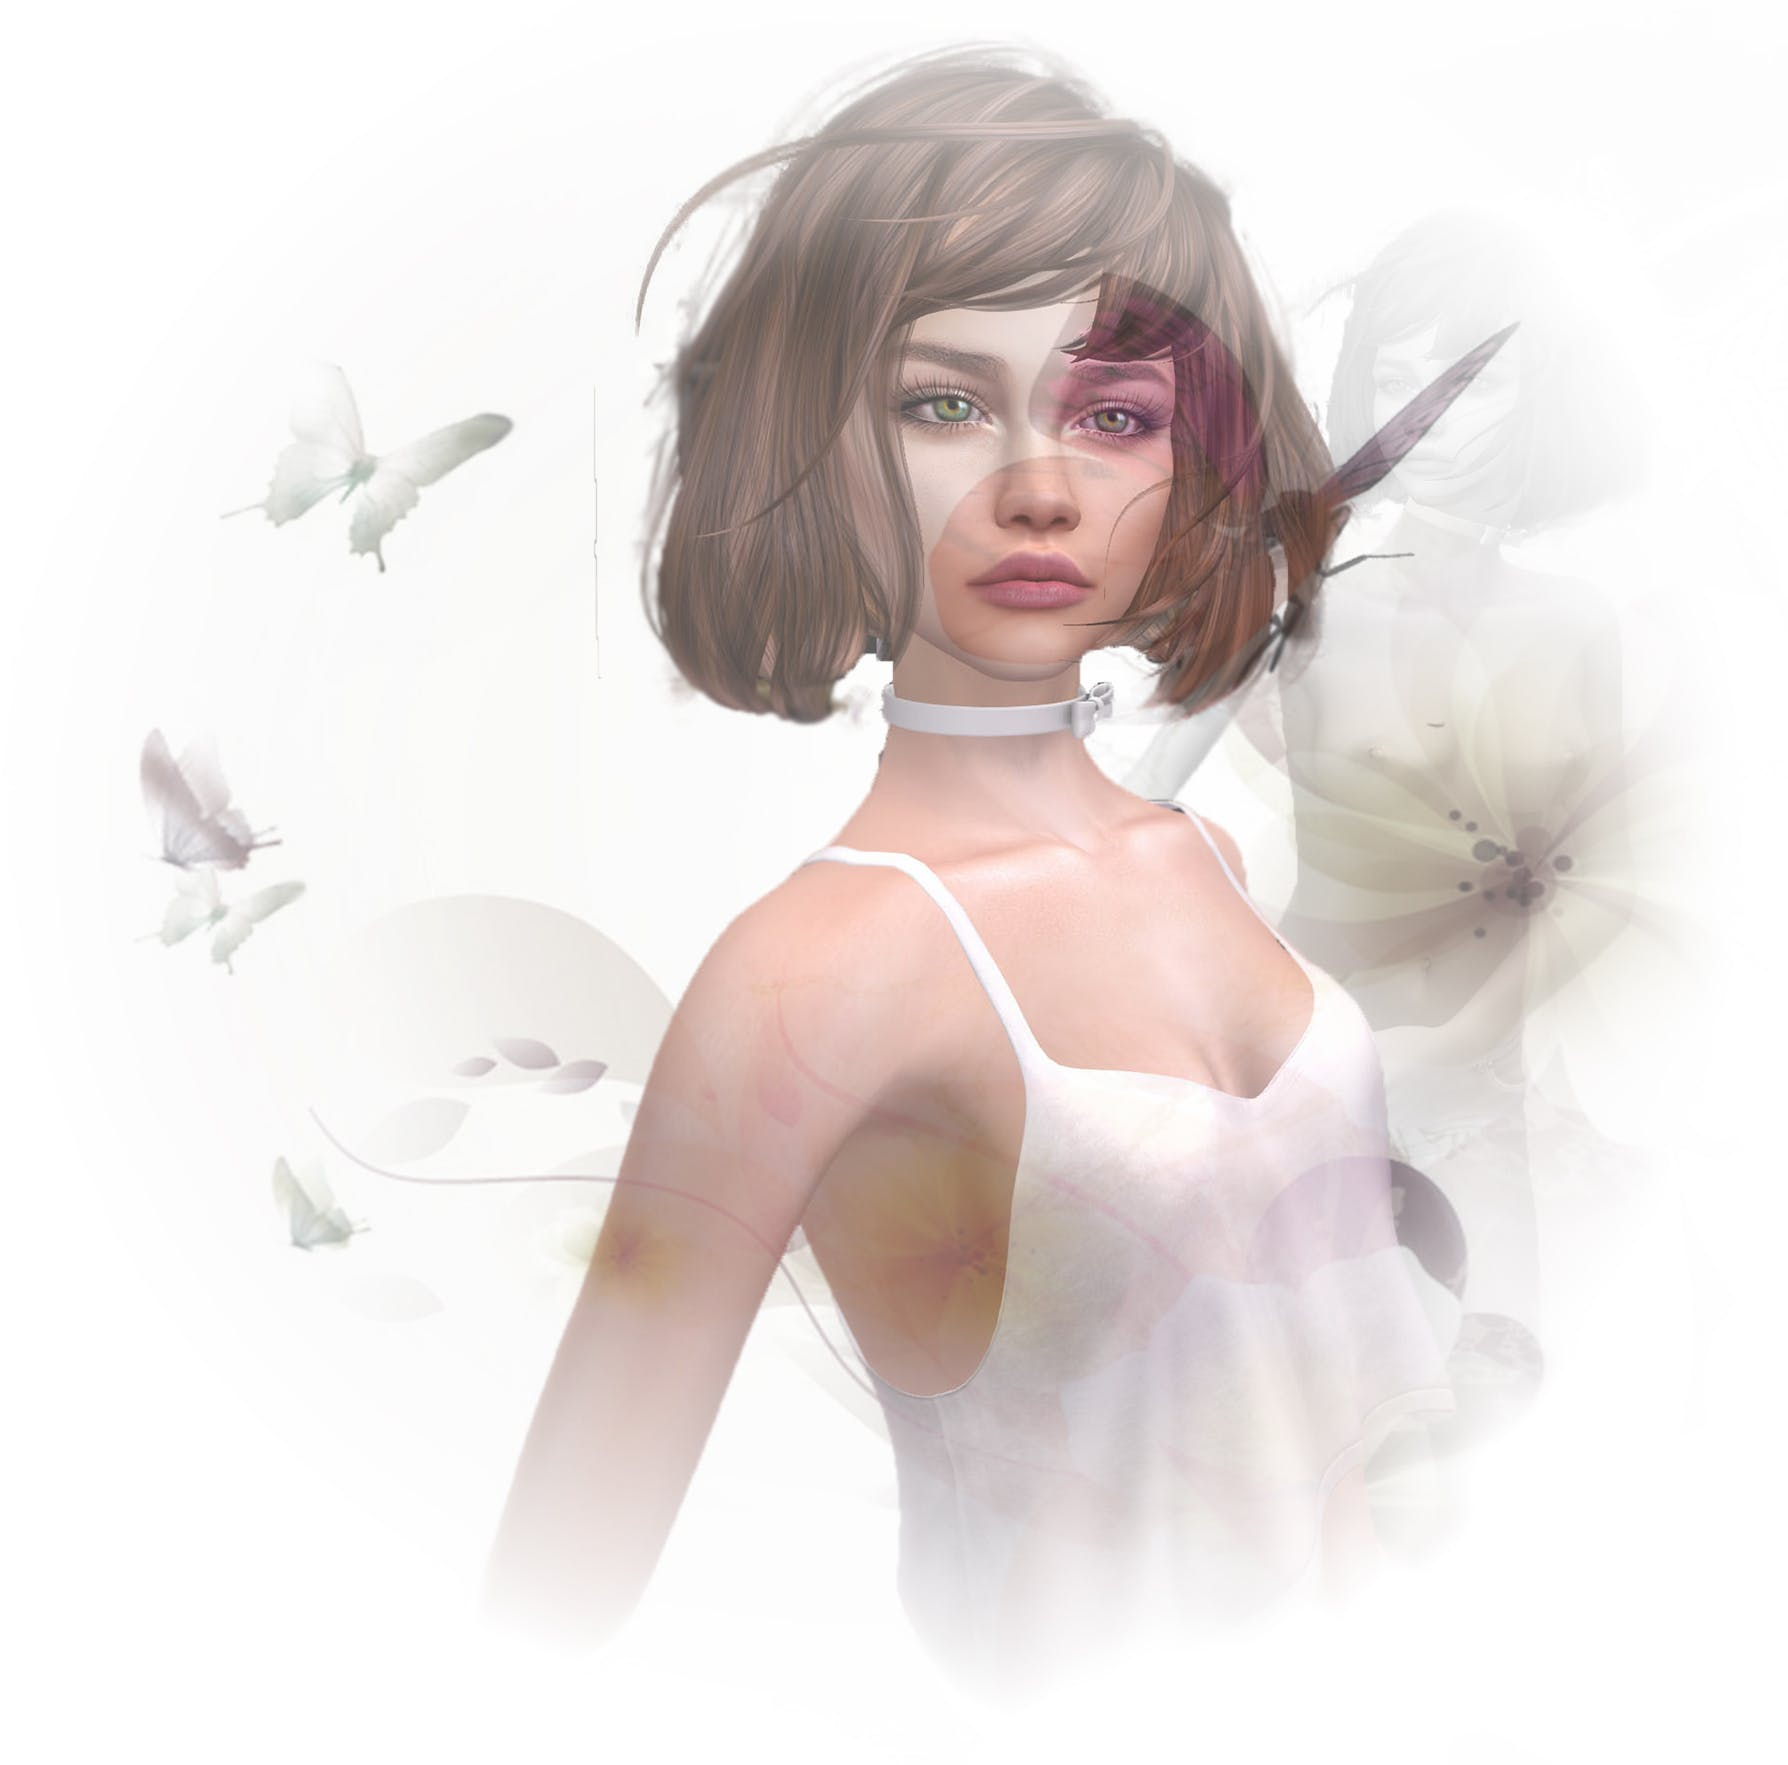 Free stock photo of nude, beautiful girl, digital art